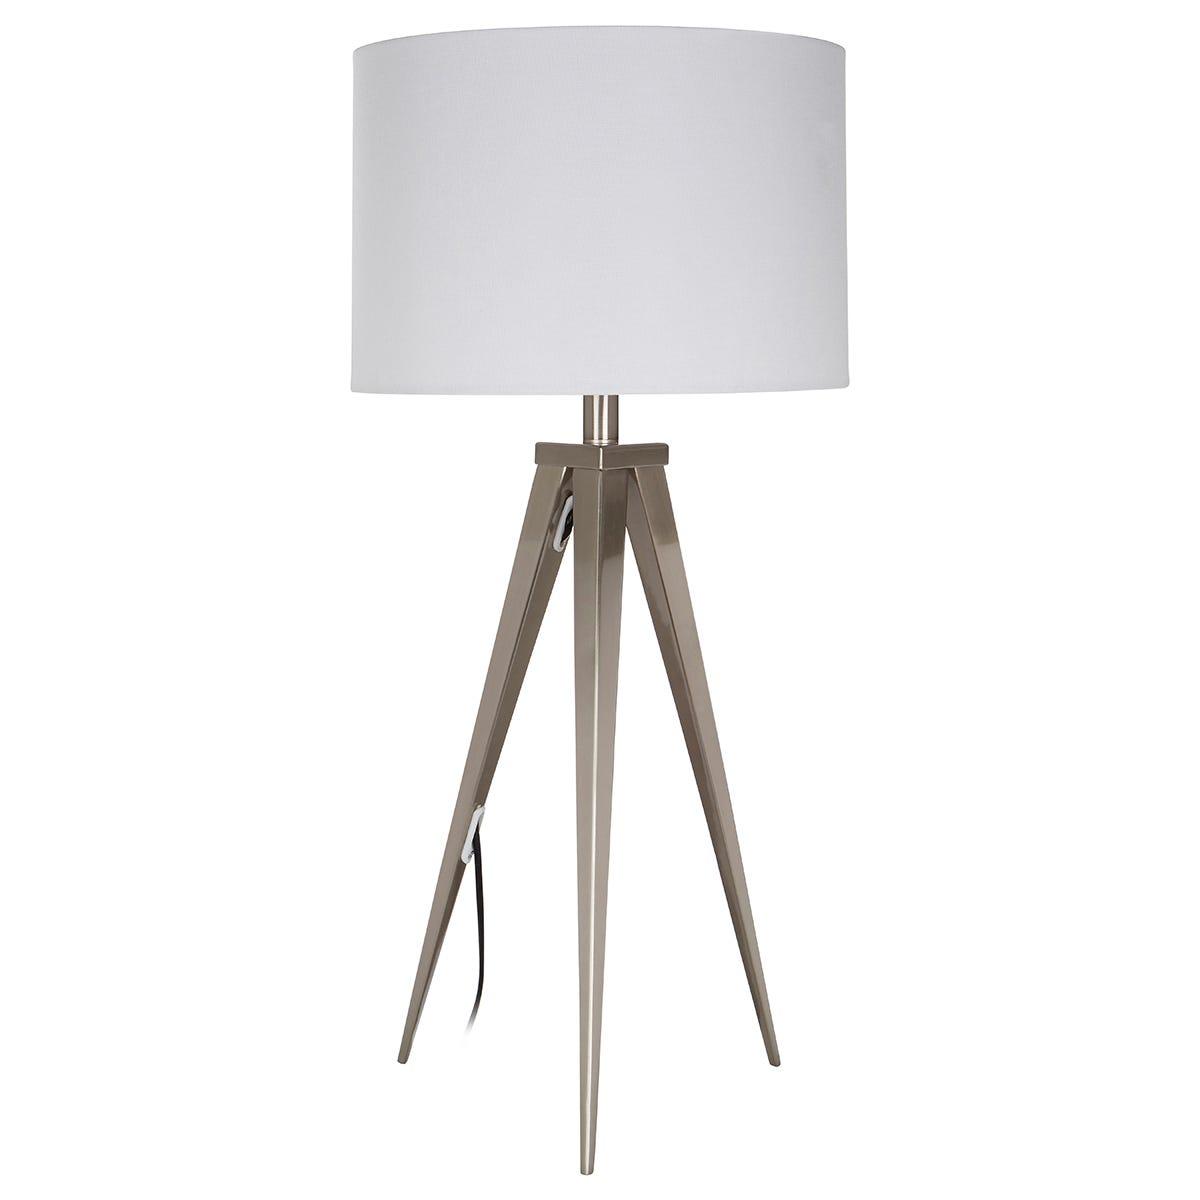 Premier Housewares Livia Table Lamp with Metal Tripod Frame & White Fabric Shade